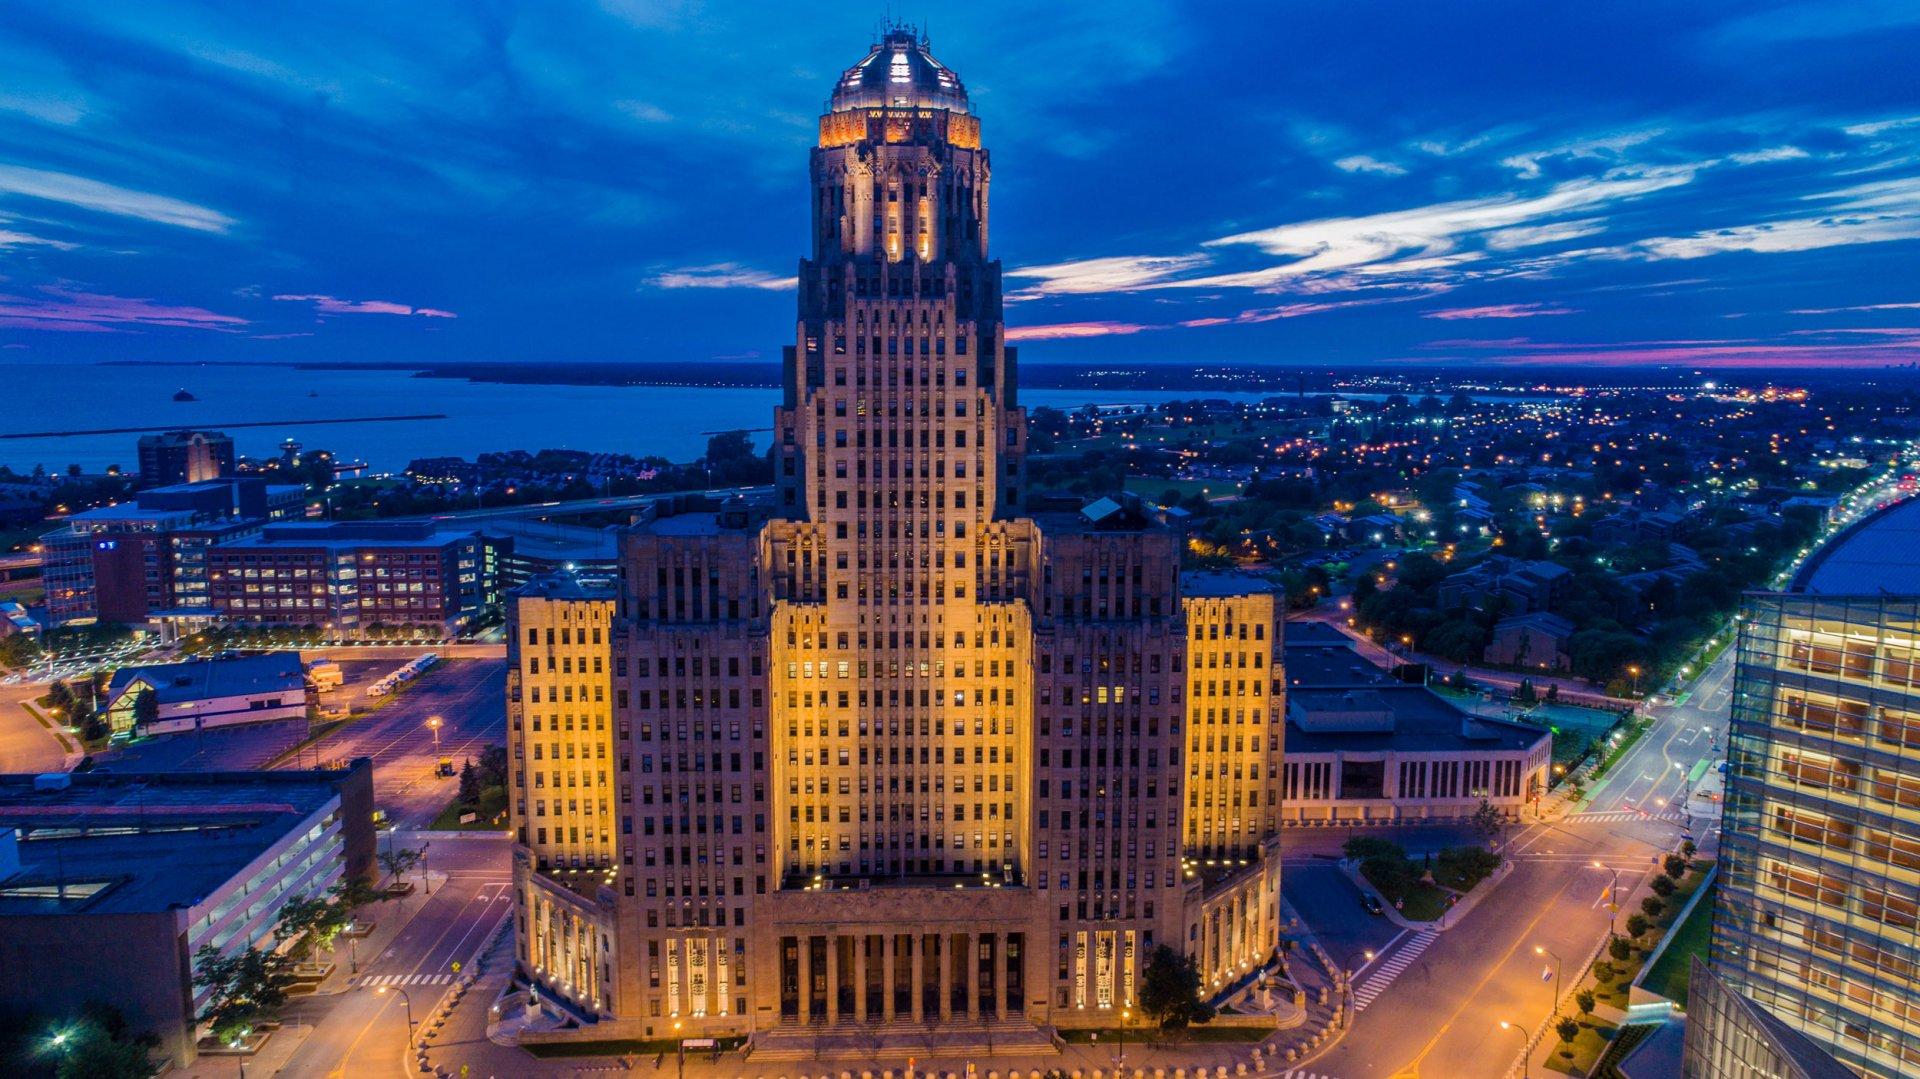 Buffalo City Hall - Exterior Lighting